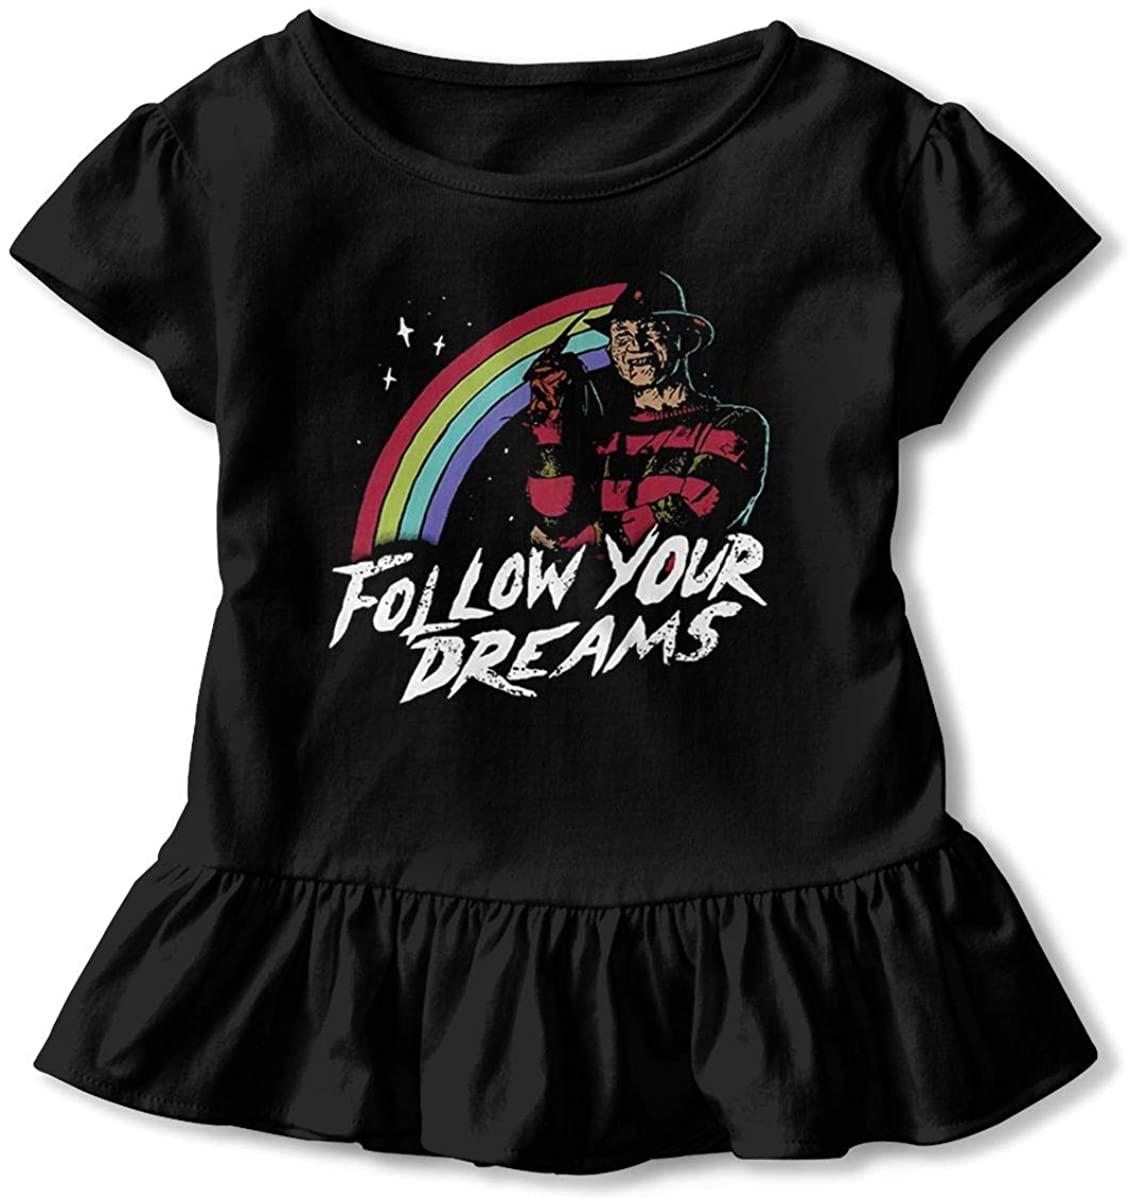 King Gizzard and Lizard Wizard Baby Girls Basic Shirts Toddler Short Sleeve T-Shirts Essential Ruffle T-Shirt